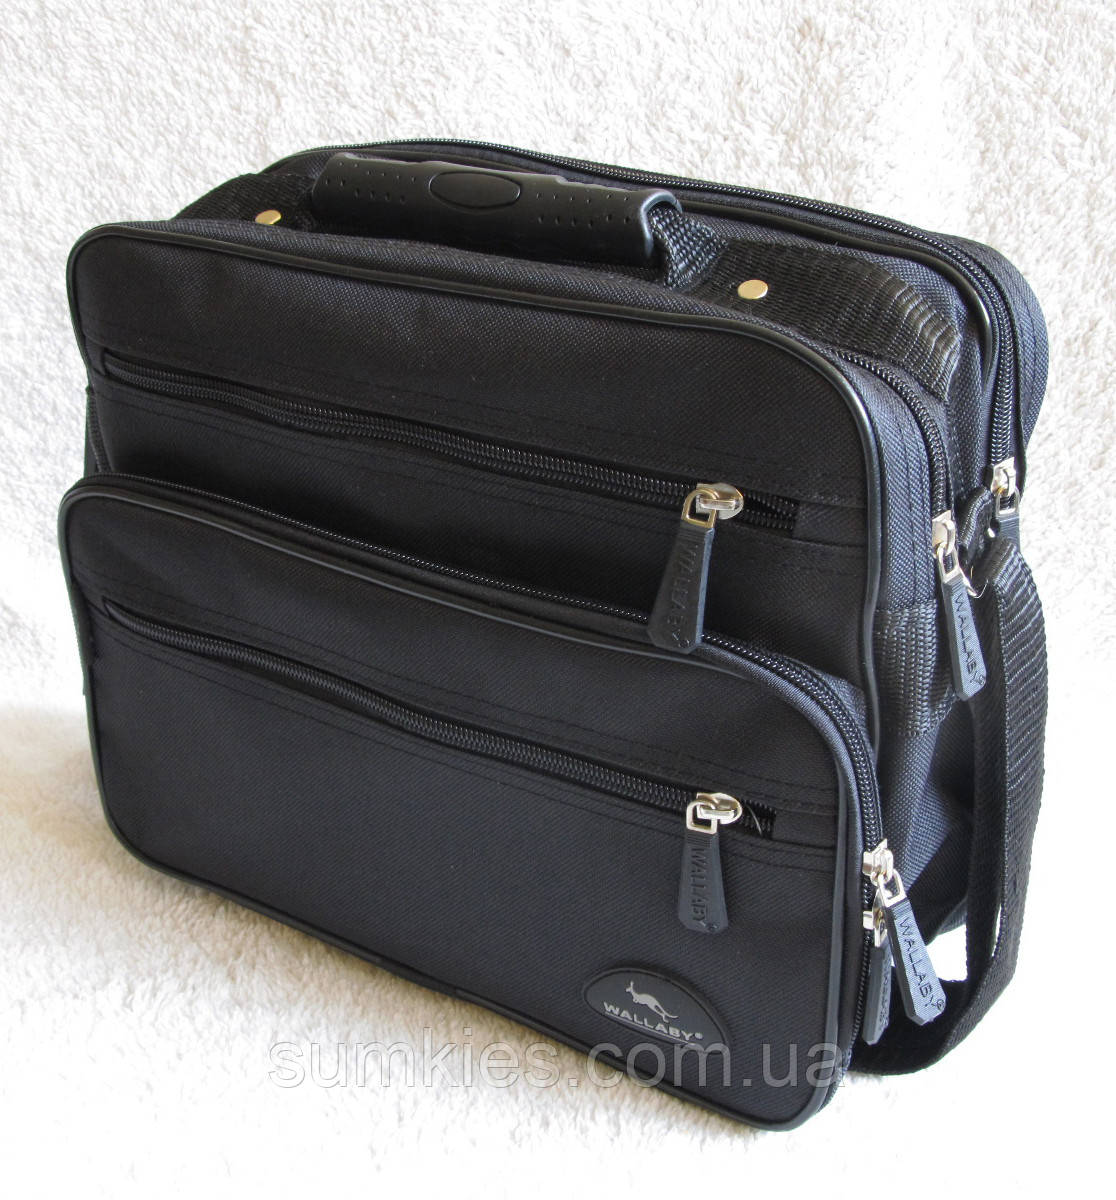 Мужская сумка через плечо портфель 8w2411 черная 29х24х16см